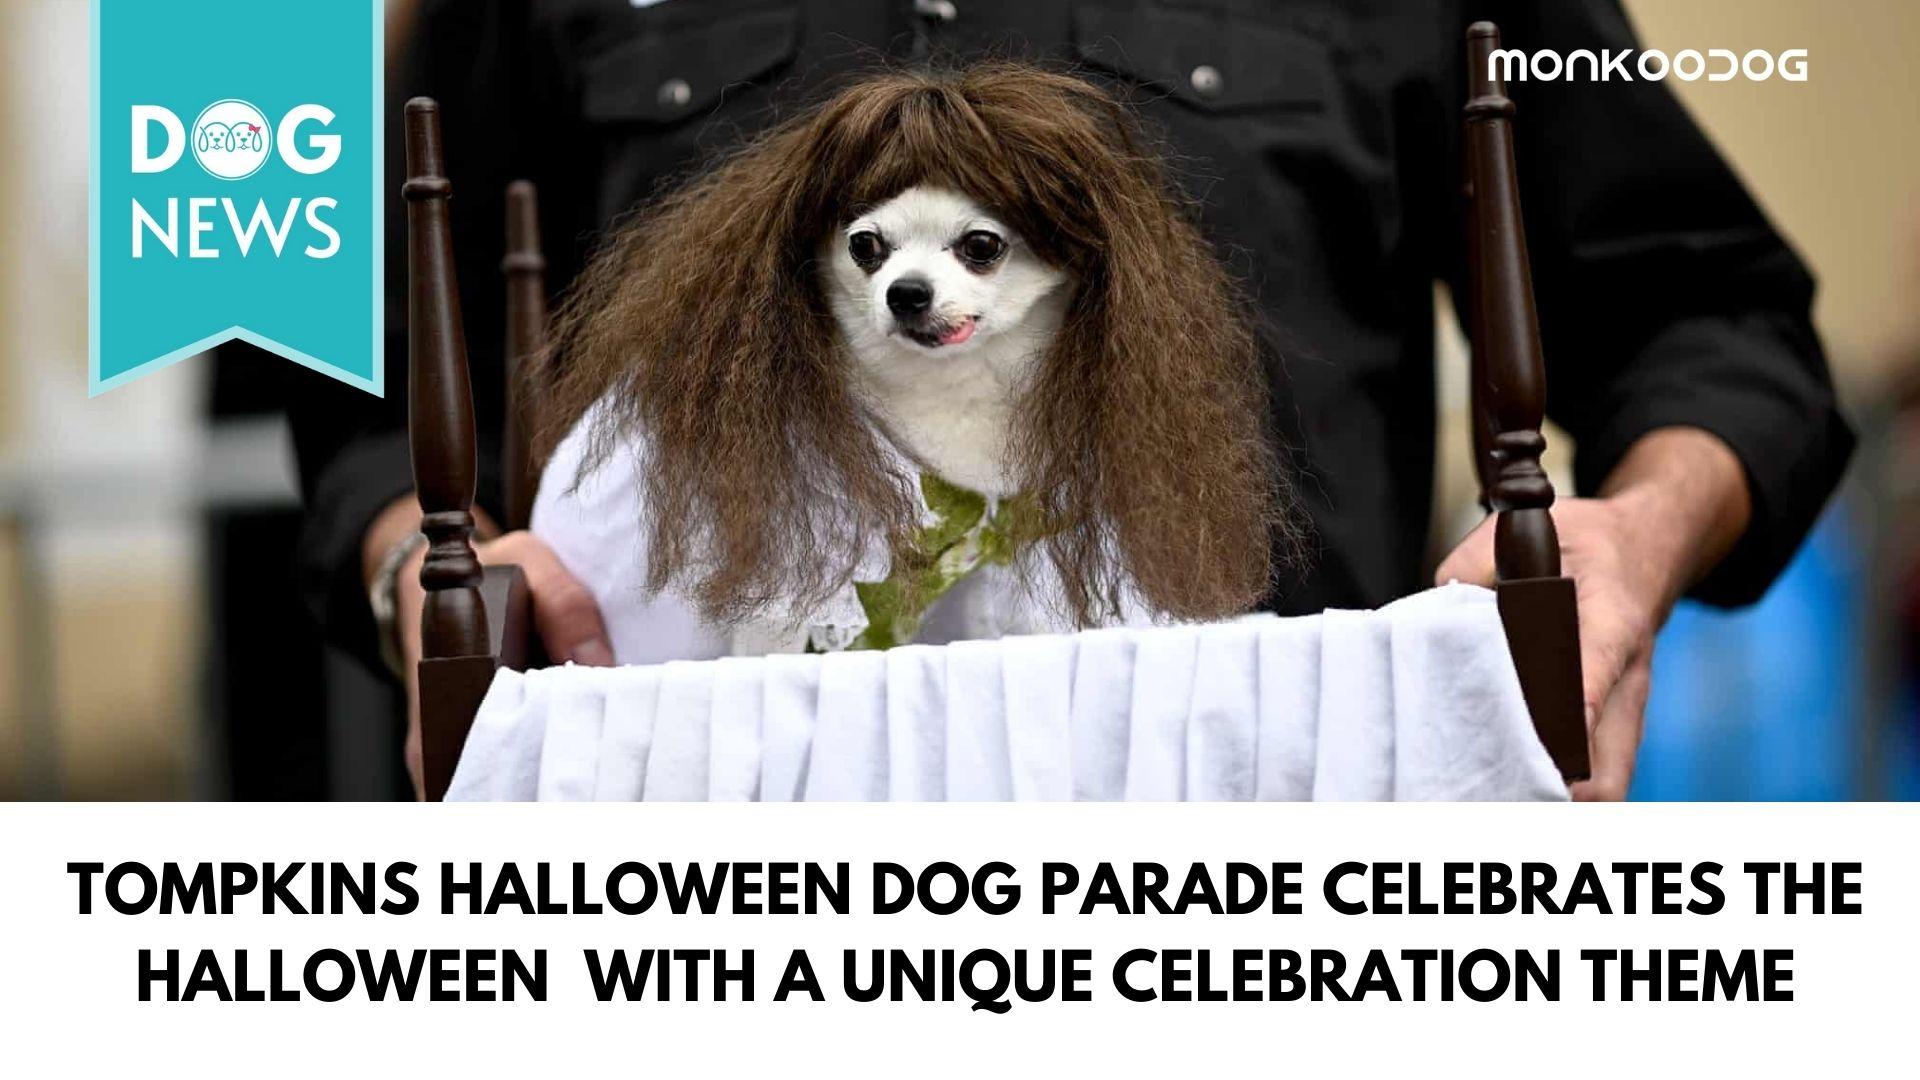 Tompkins Halloween Dog Parade 2020 becomes a global viral sensation with a unique celebration theme